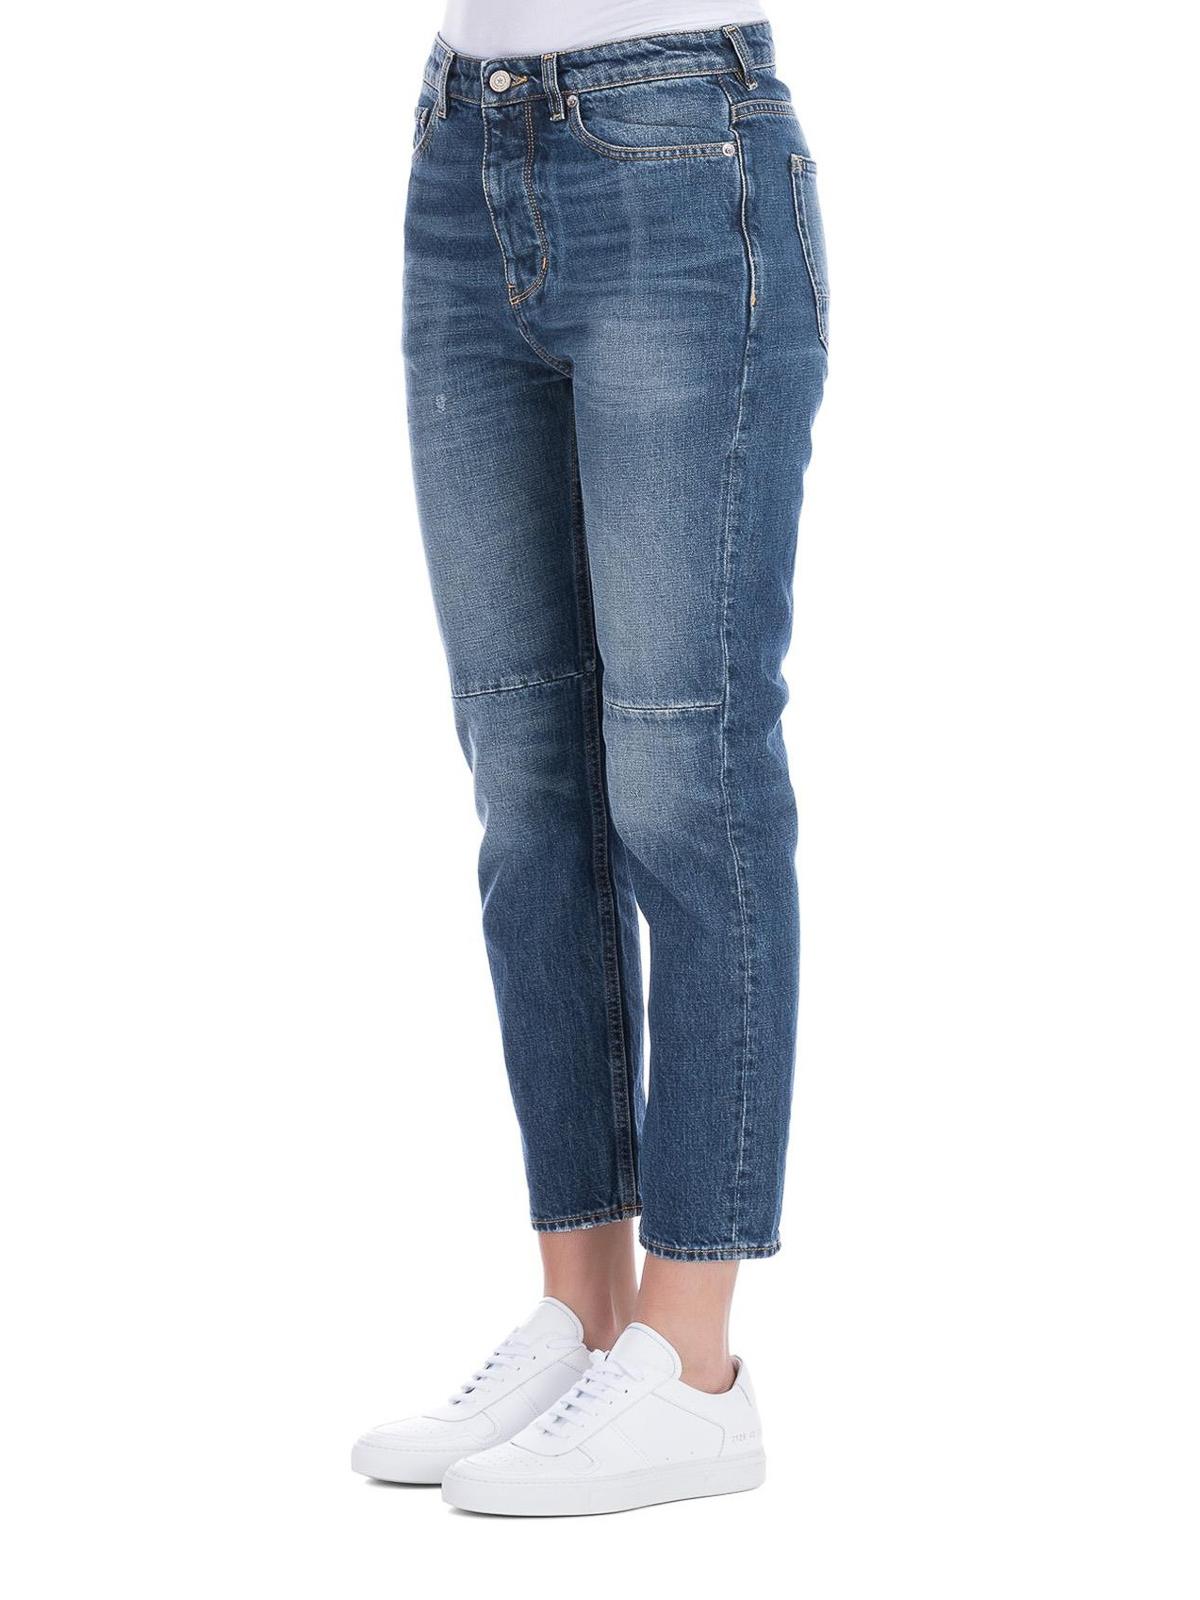 Happy jeans - straight leg jeans